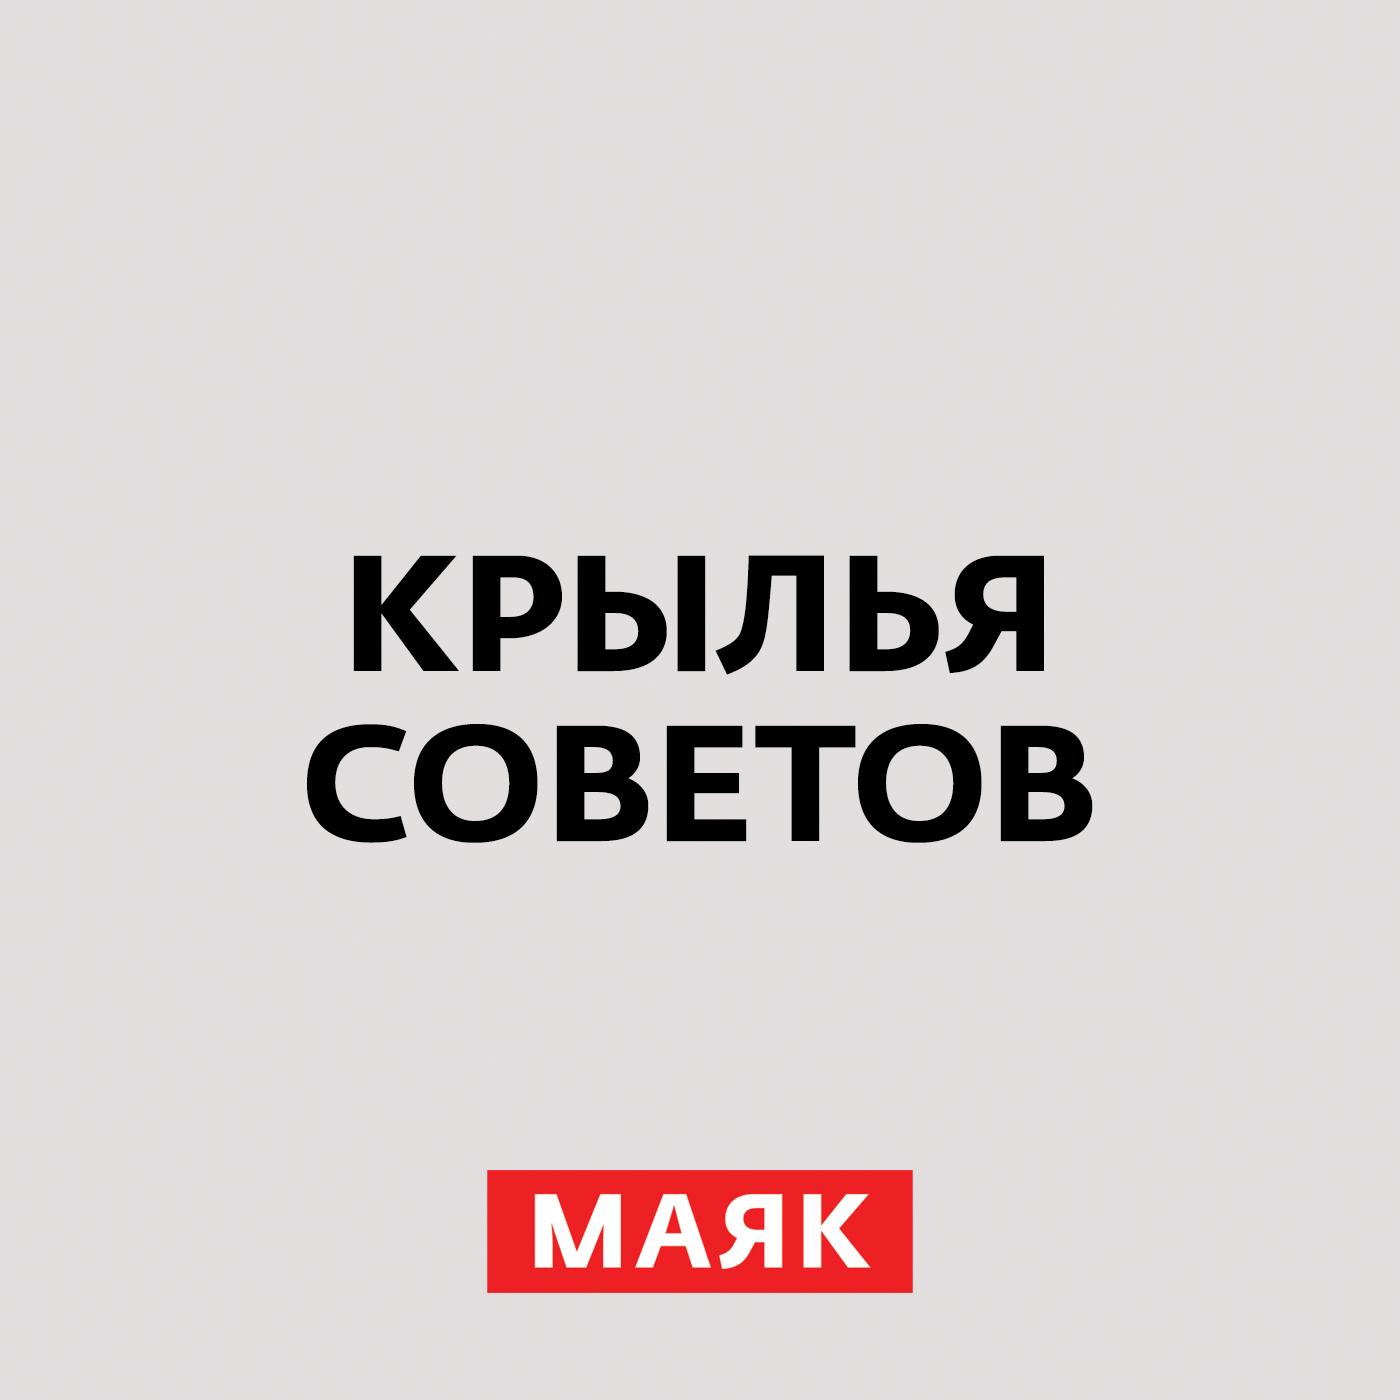 Творческий коллектив радио «Маяк» Русский витязь цена и фото